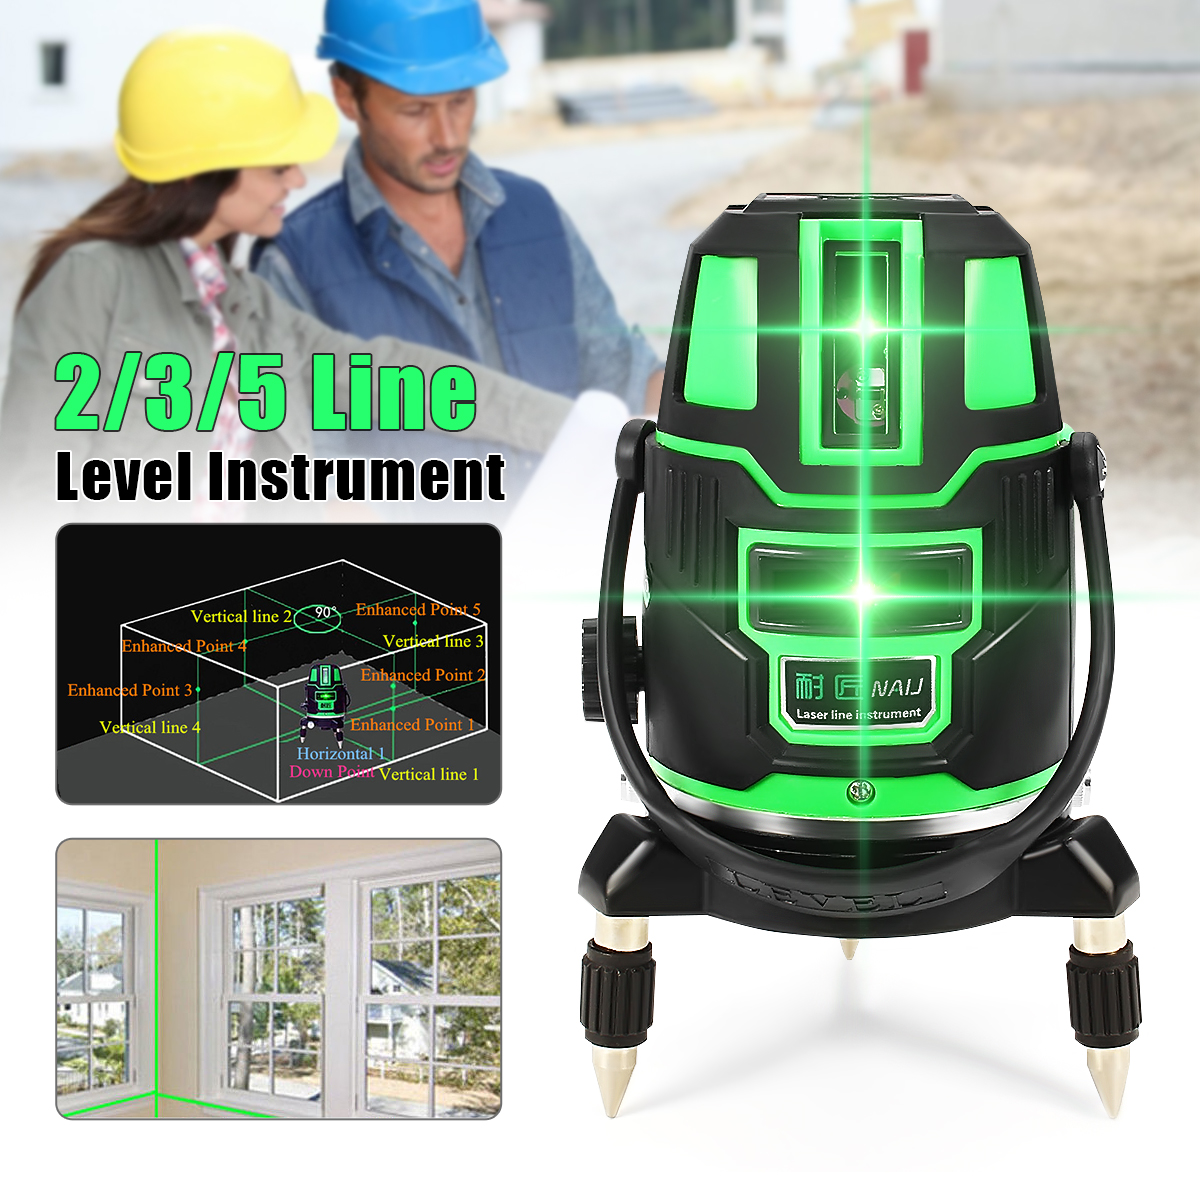 Green Laser Level 2/3/5 Cross Lines Self Leveling 360 Rotary Measure Tool Set US Plug Radius Indoor/Outdoor Alternating Direct